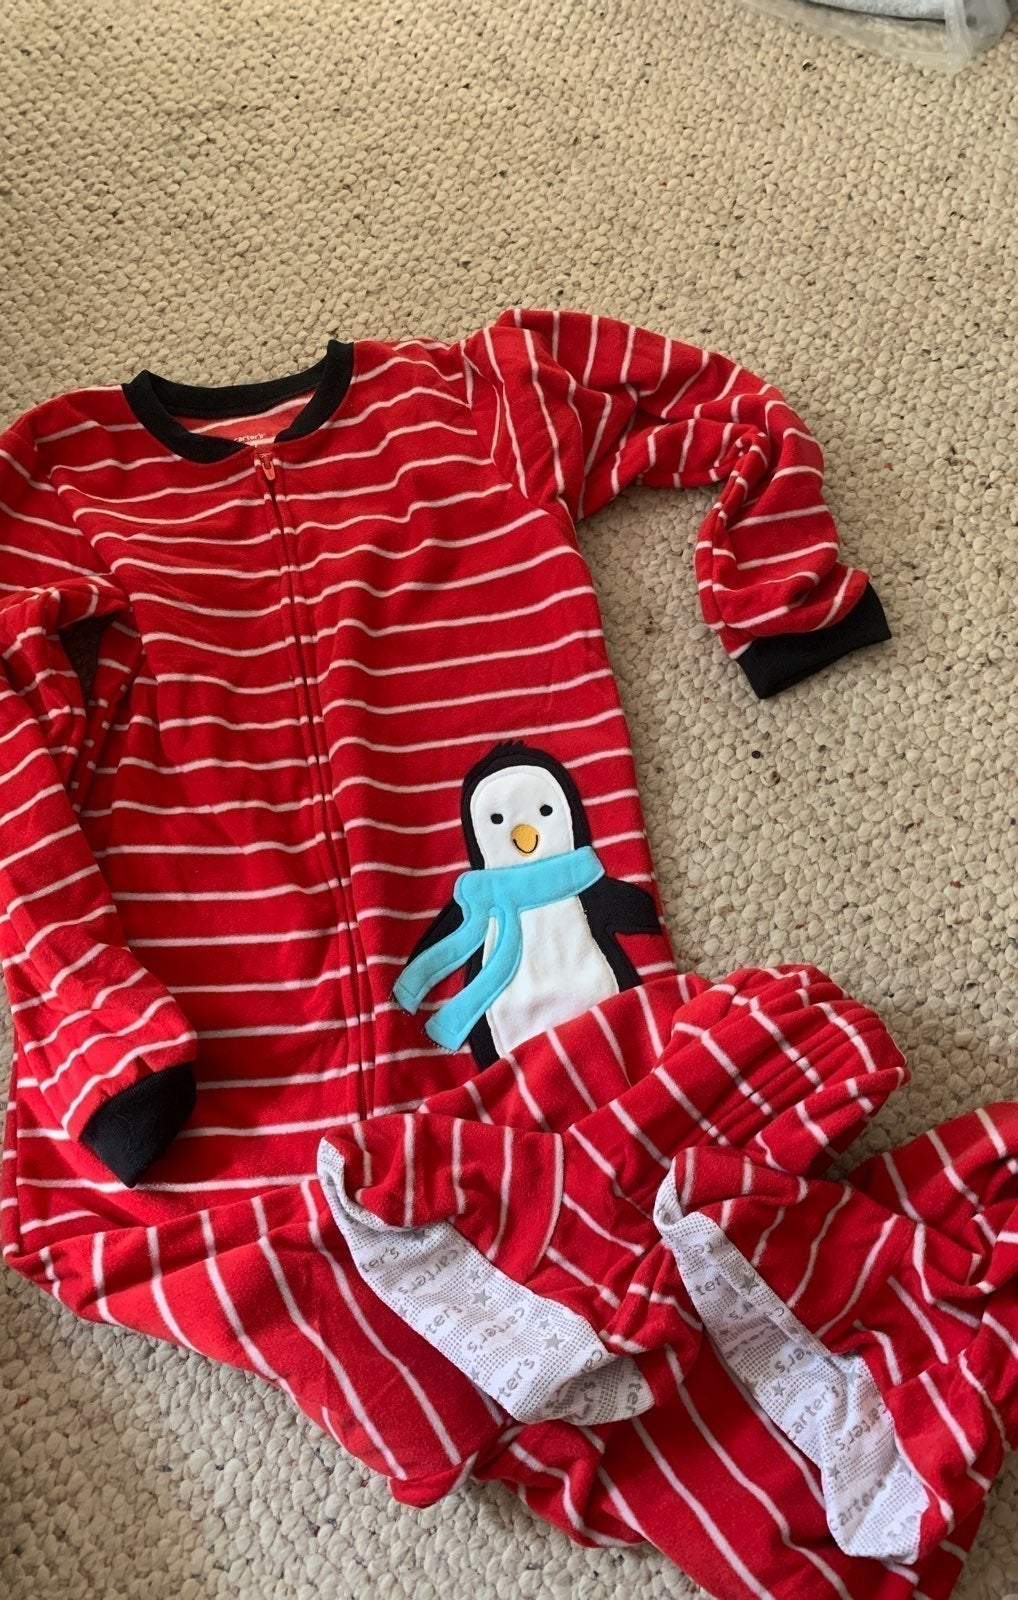 Carter's Footies Pajamas